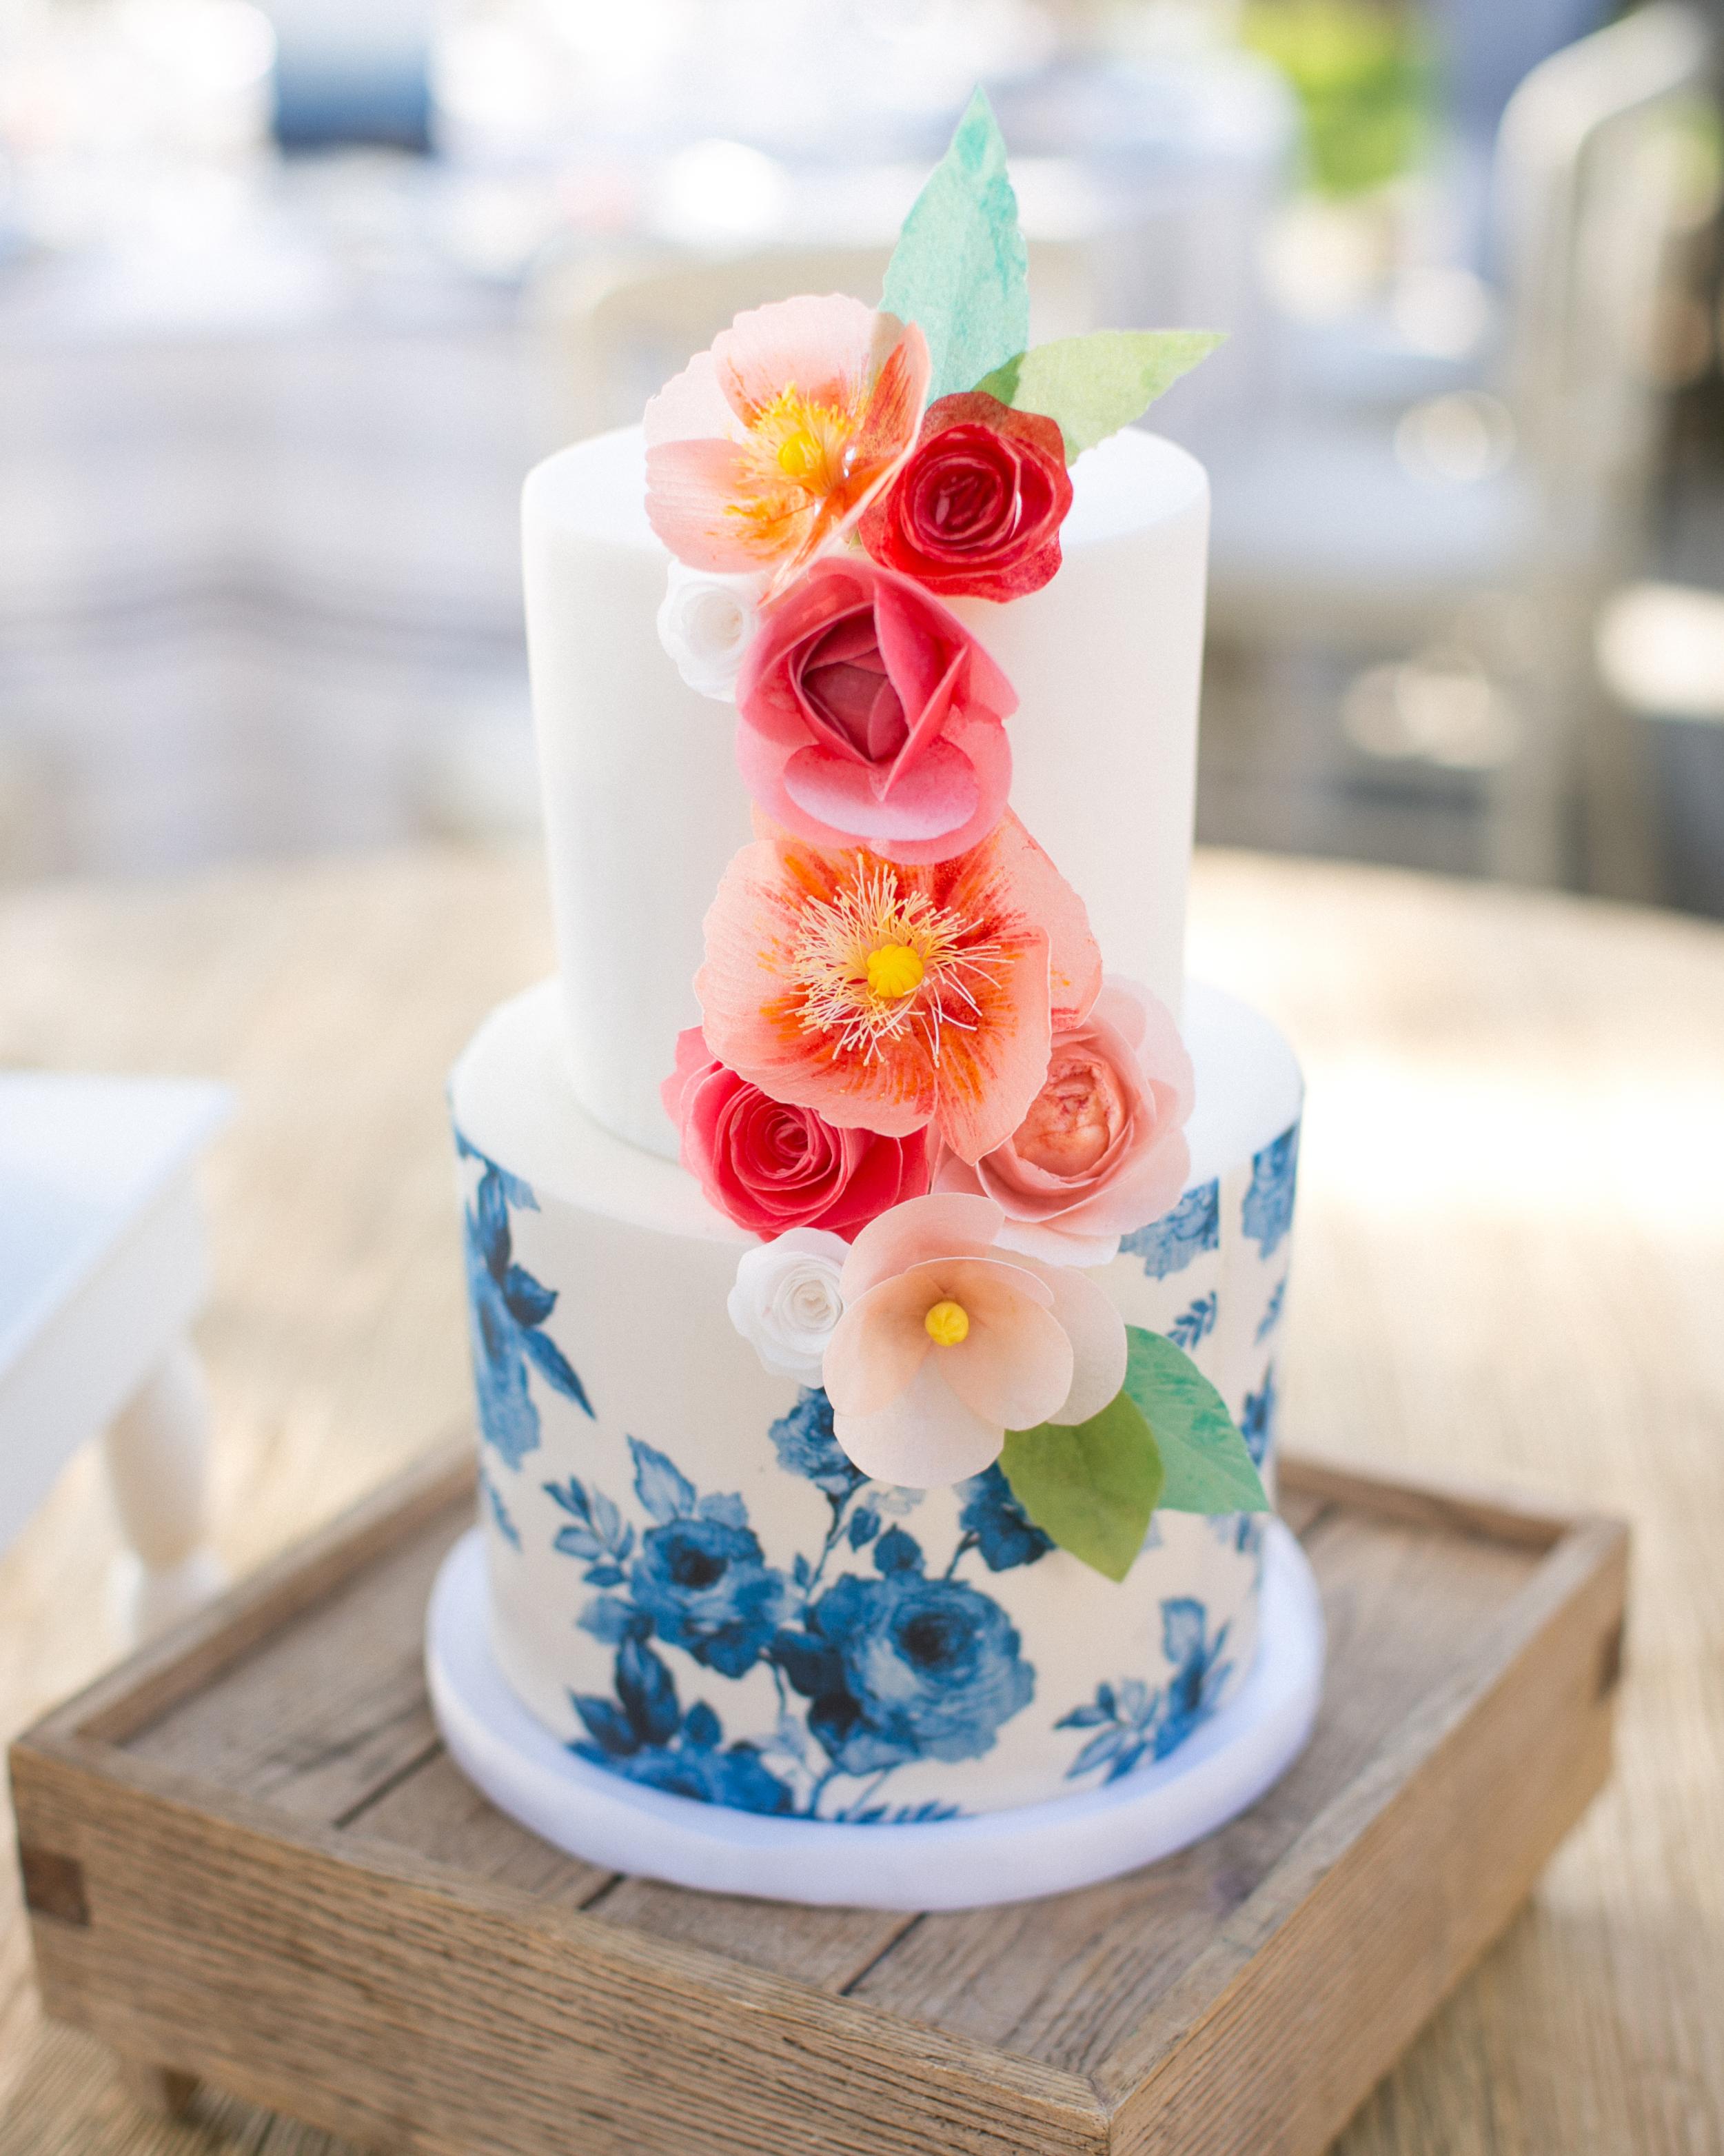 jess-clint-wedding-cake-259-s111420-0814.jpg